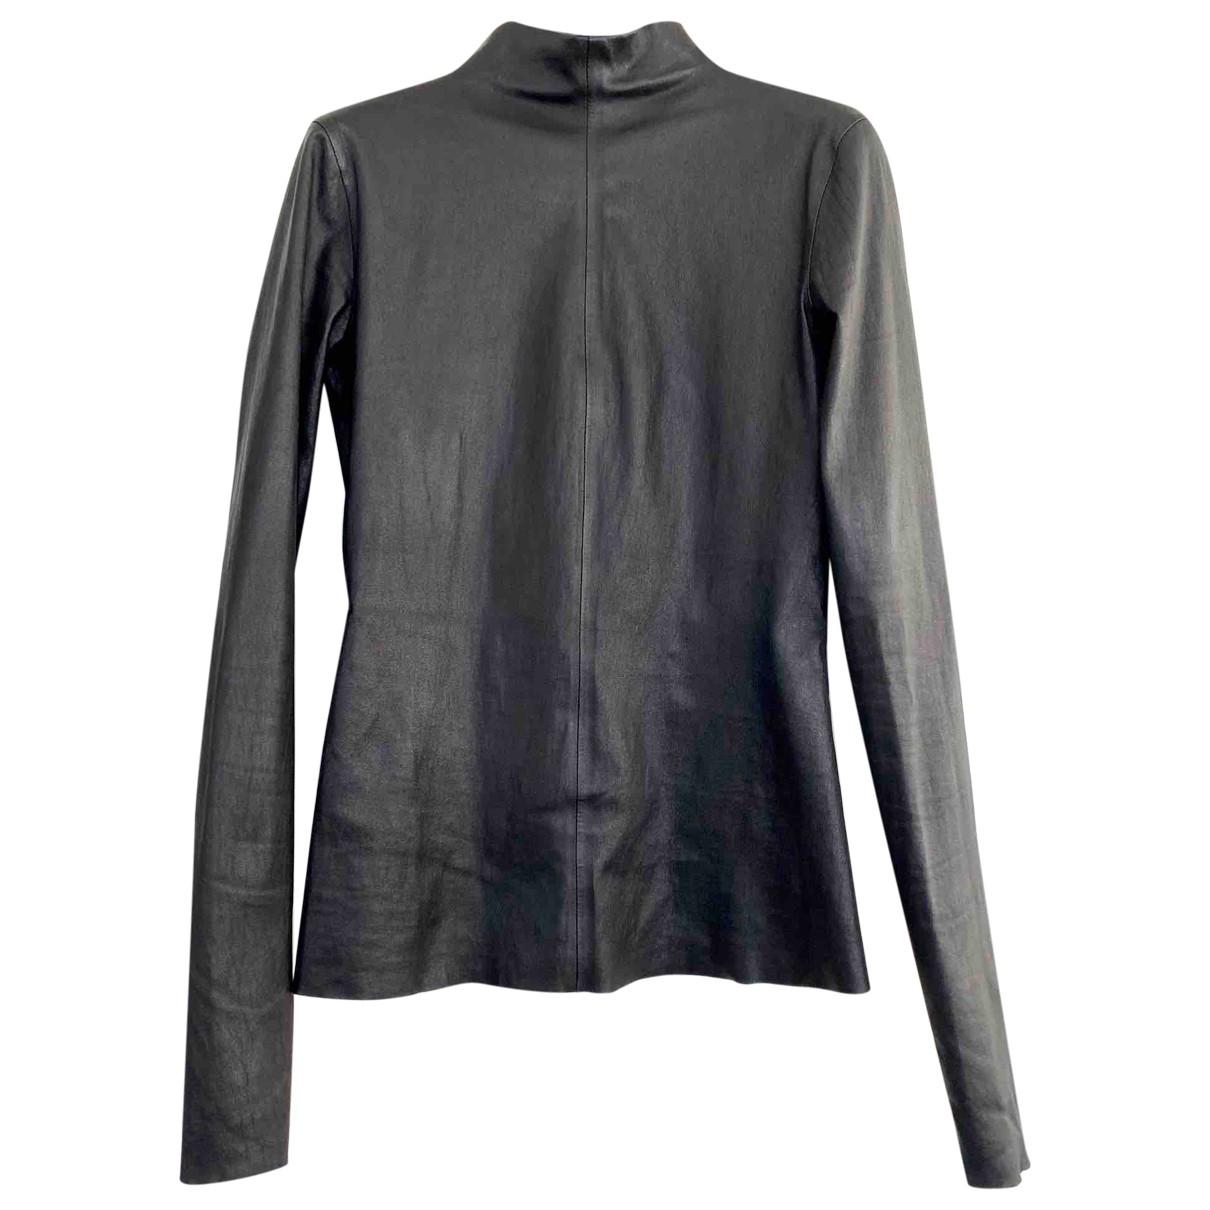 Bottega Veneta \N Black Leather  top for Women 38 IT